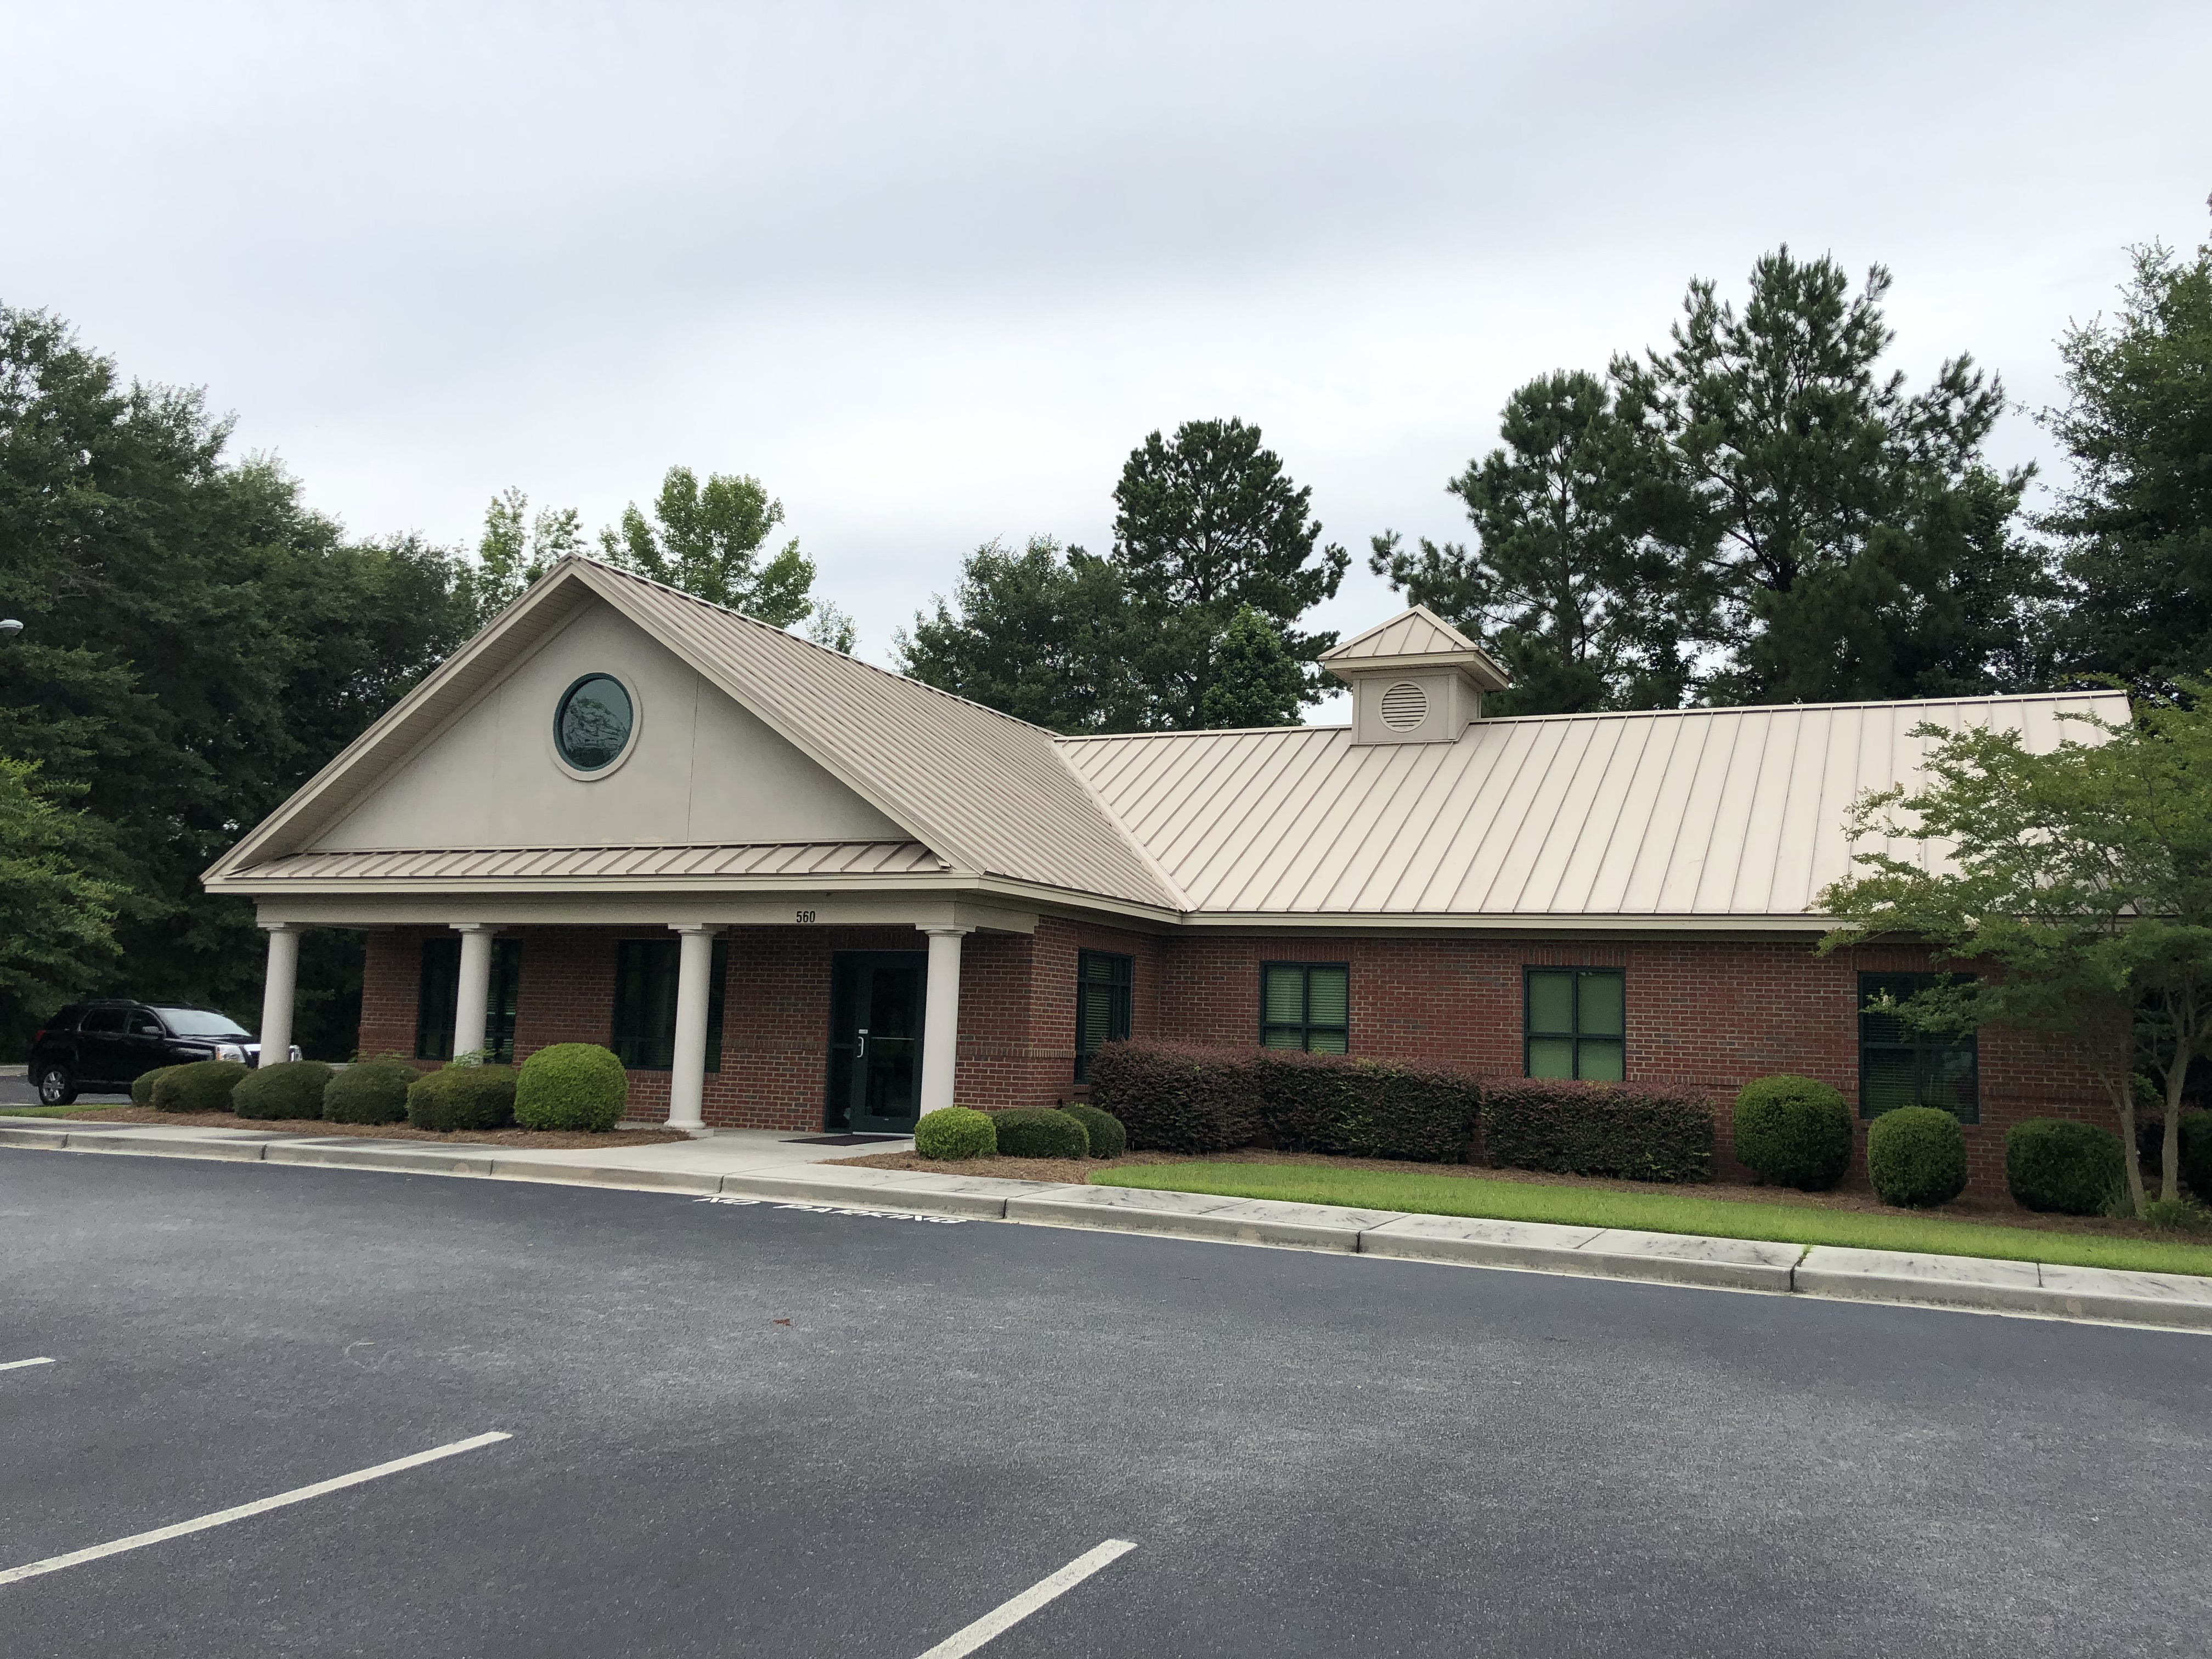 540 Constitution Dr, Sumter, SC 29154, Sumter, South Carolina 29150